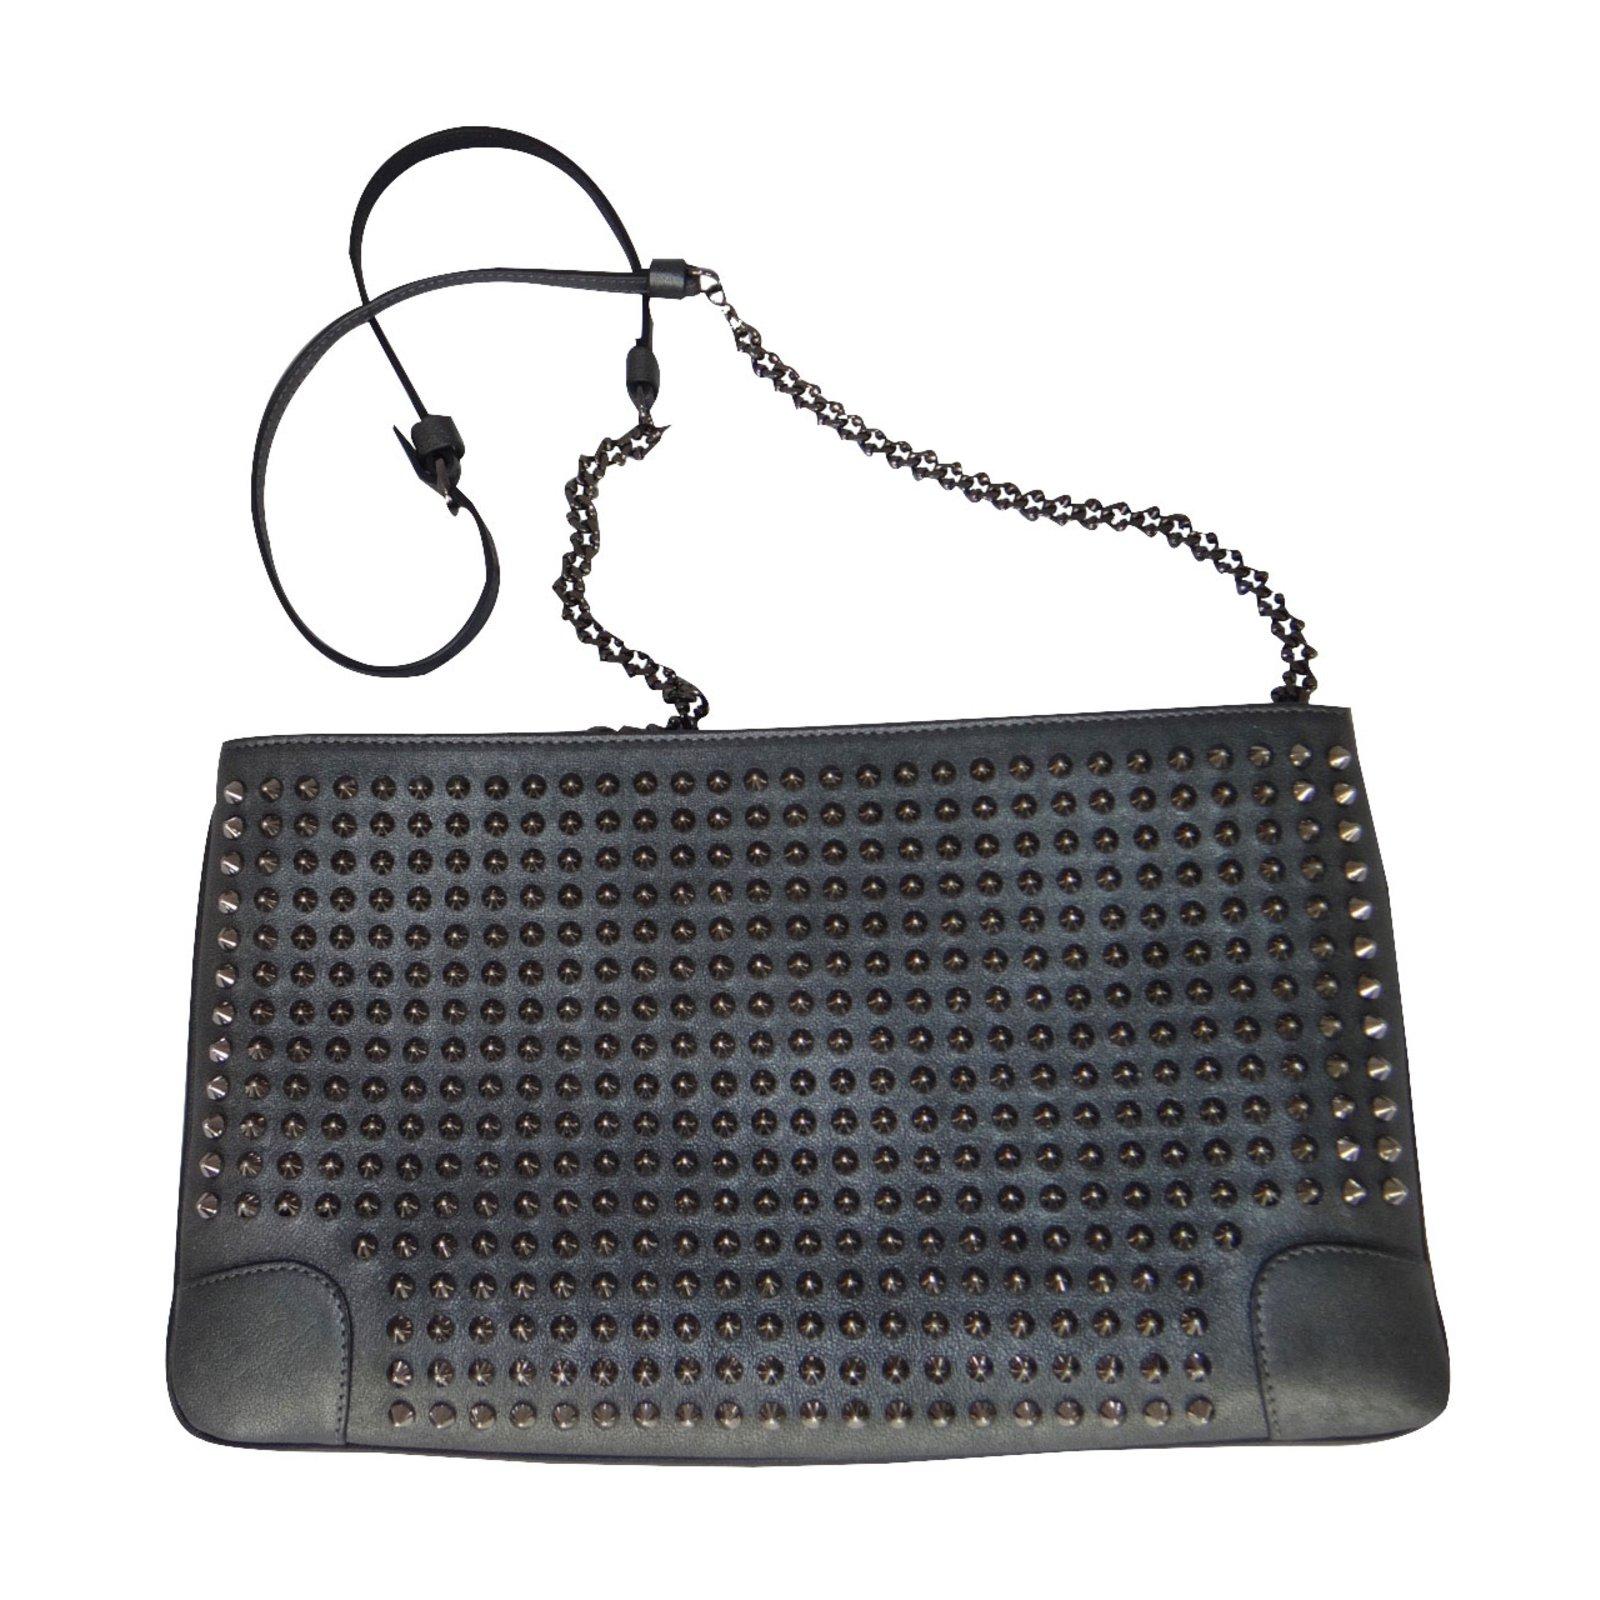 Louboutin Loubiposh Studded Leather Bag Handbags Metallic Ref 20369